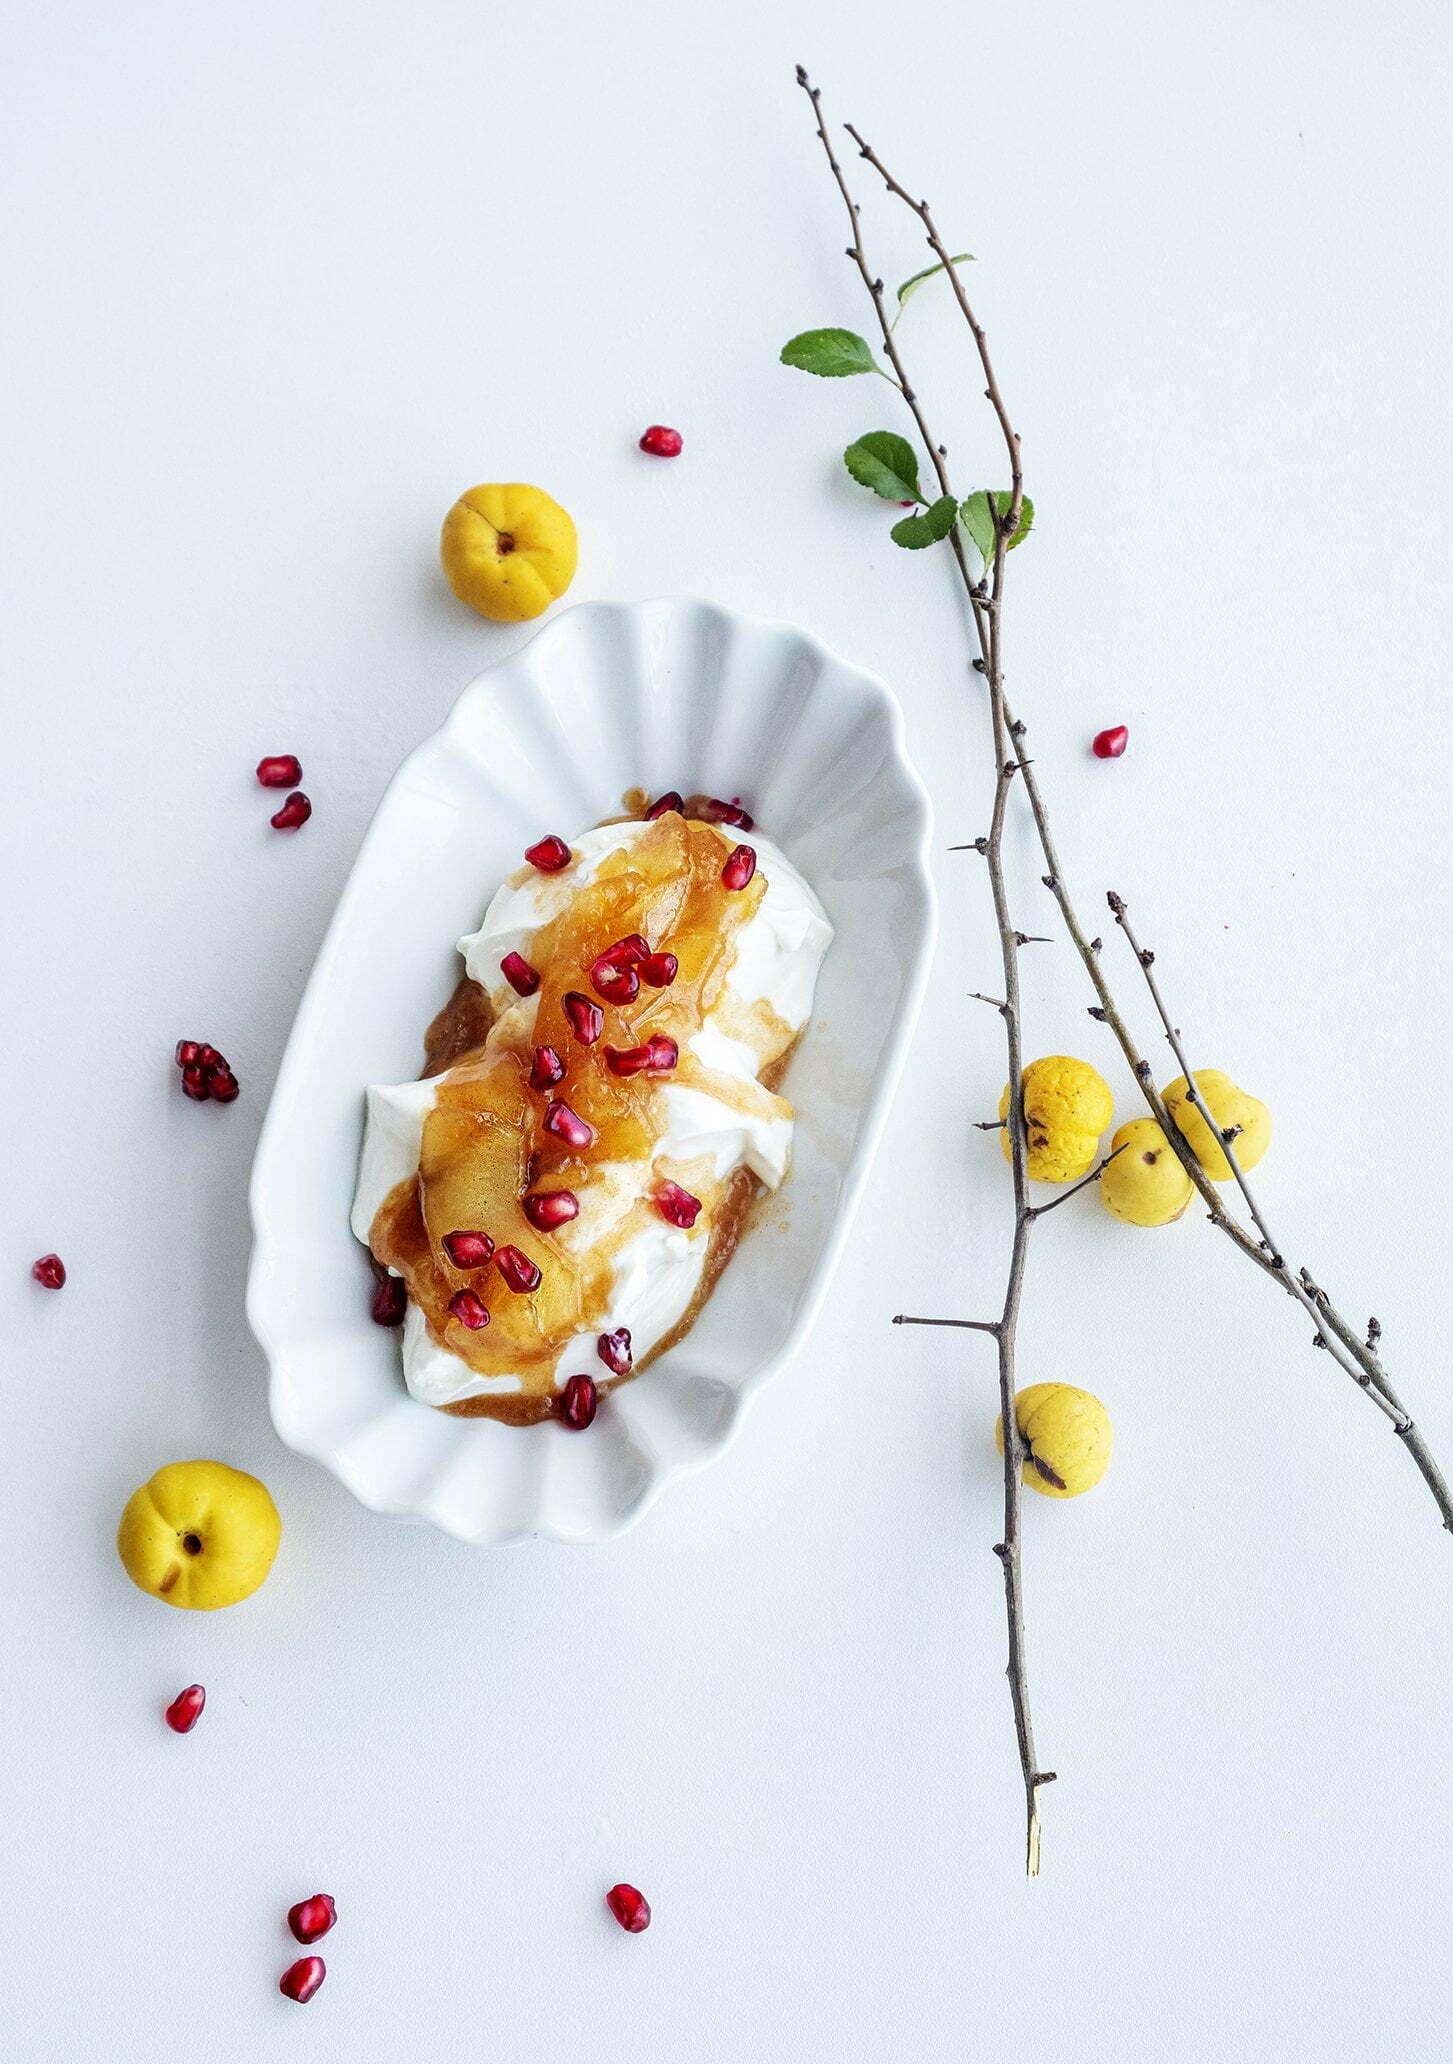 Gekarameliseerde appeltjes van Martine - Foodblogswap